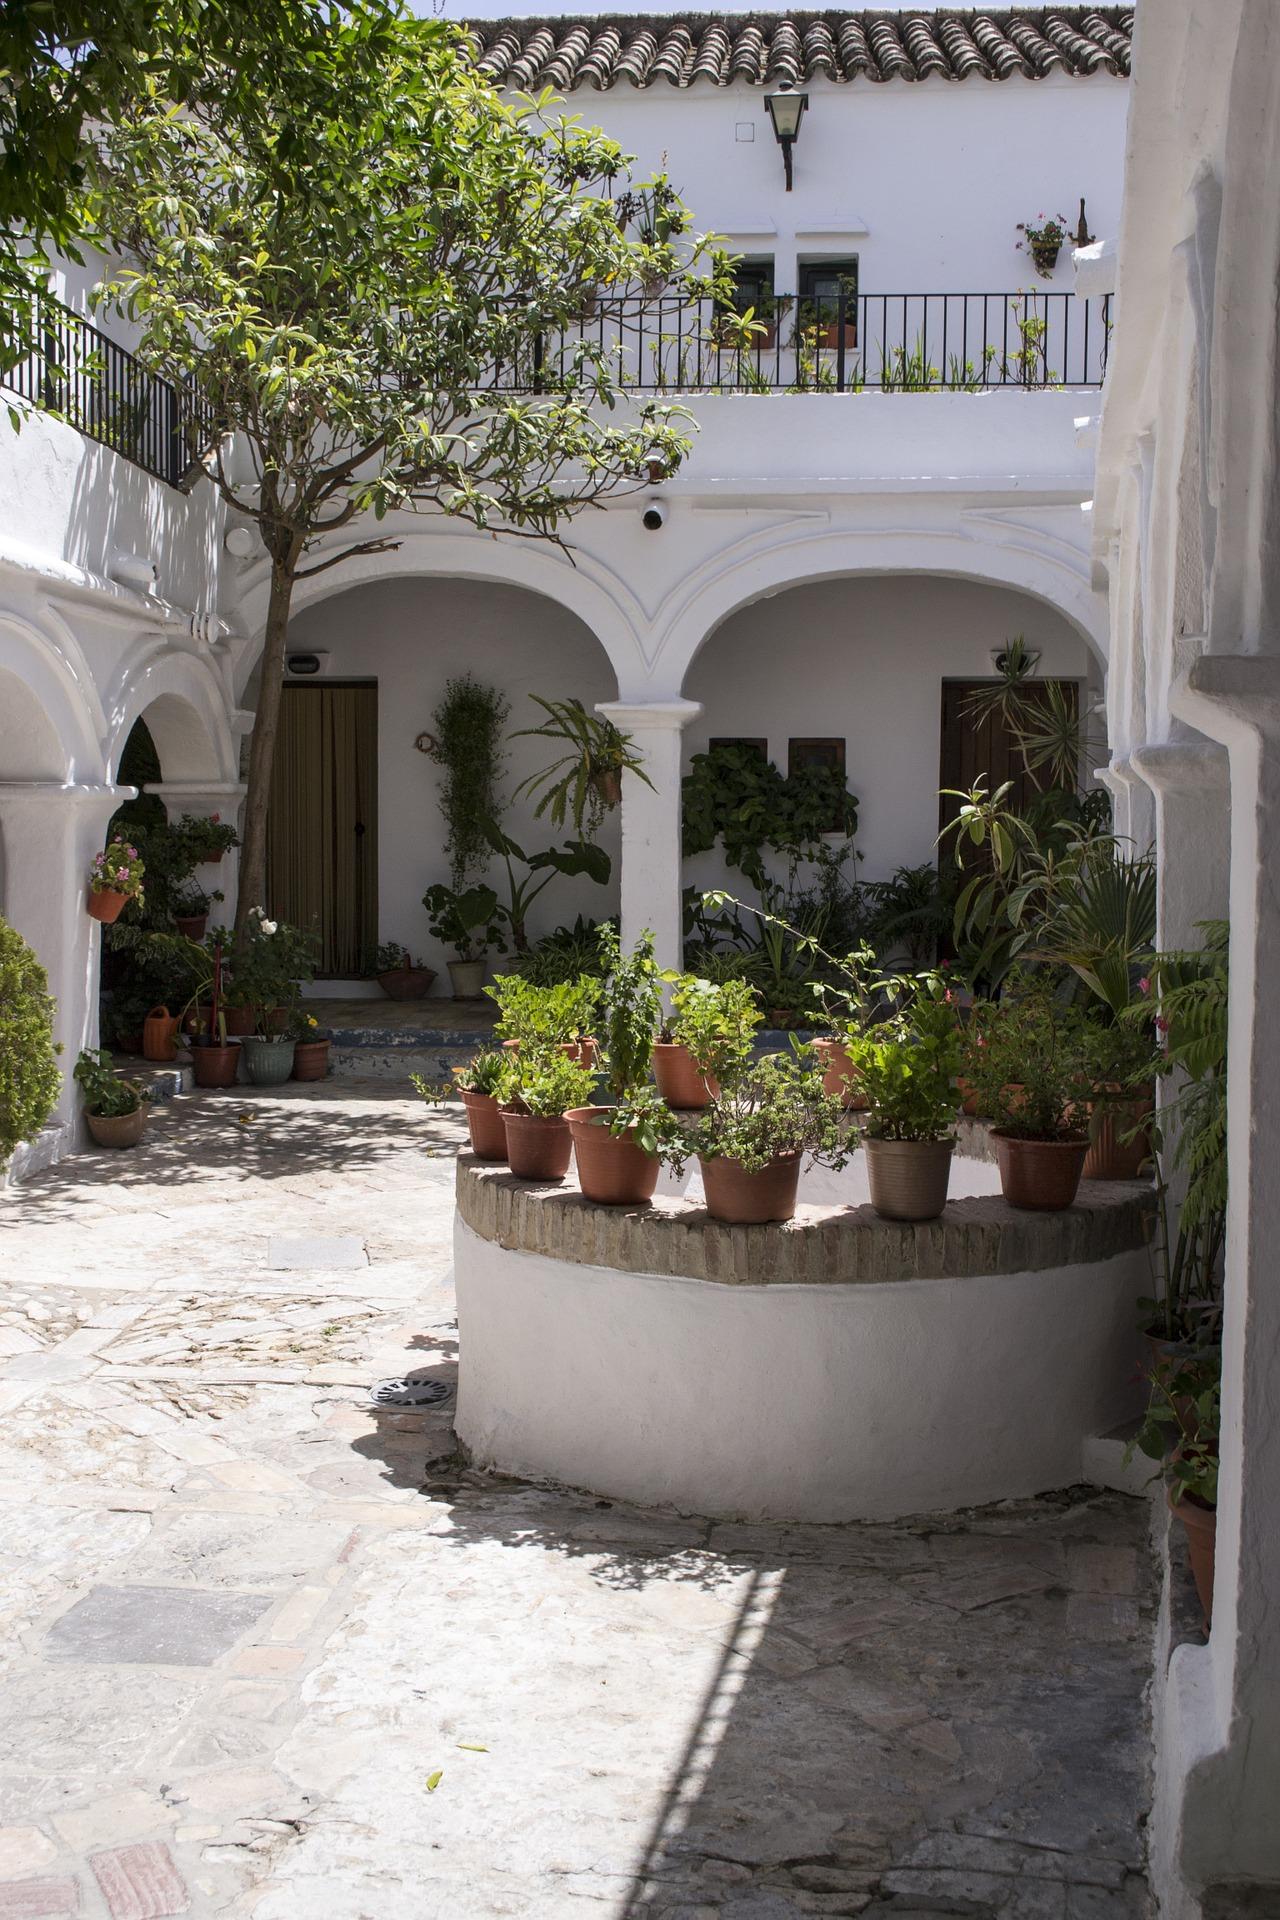 patio-1192247_1920.jpg